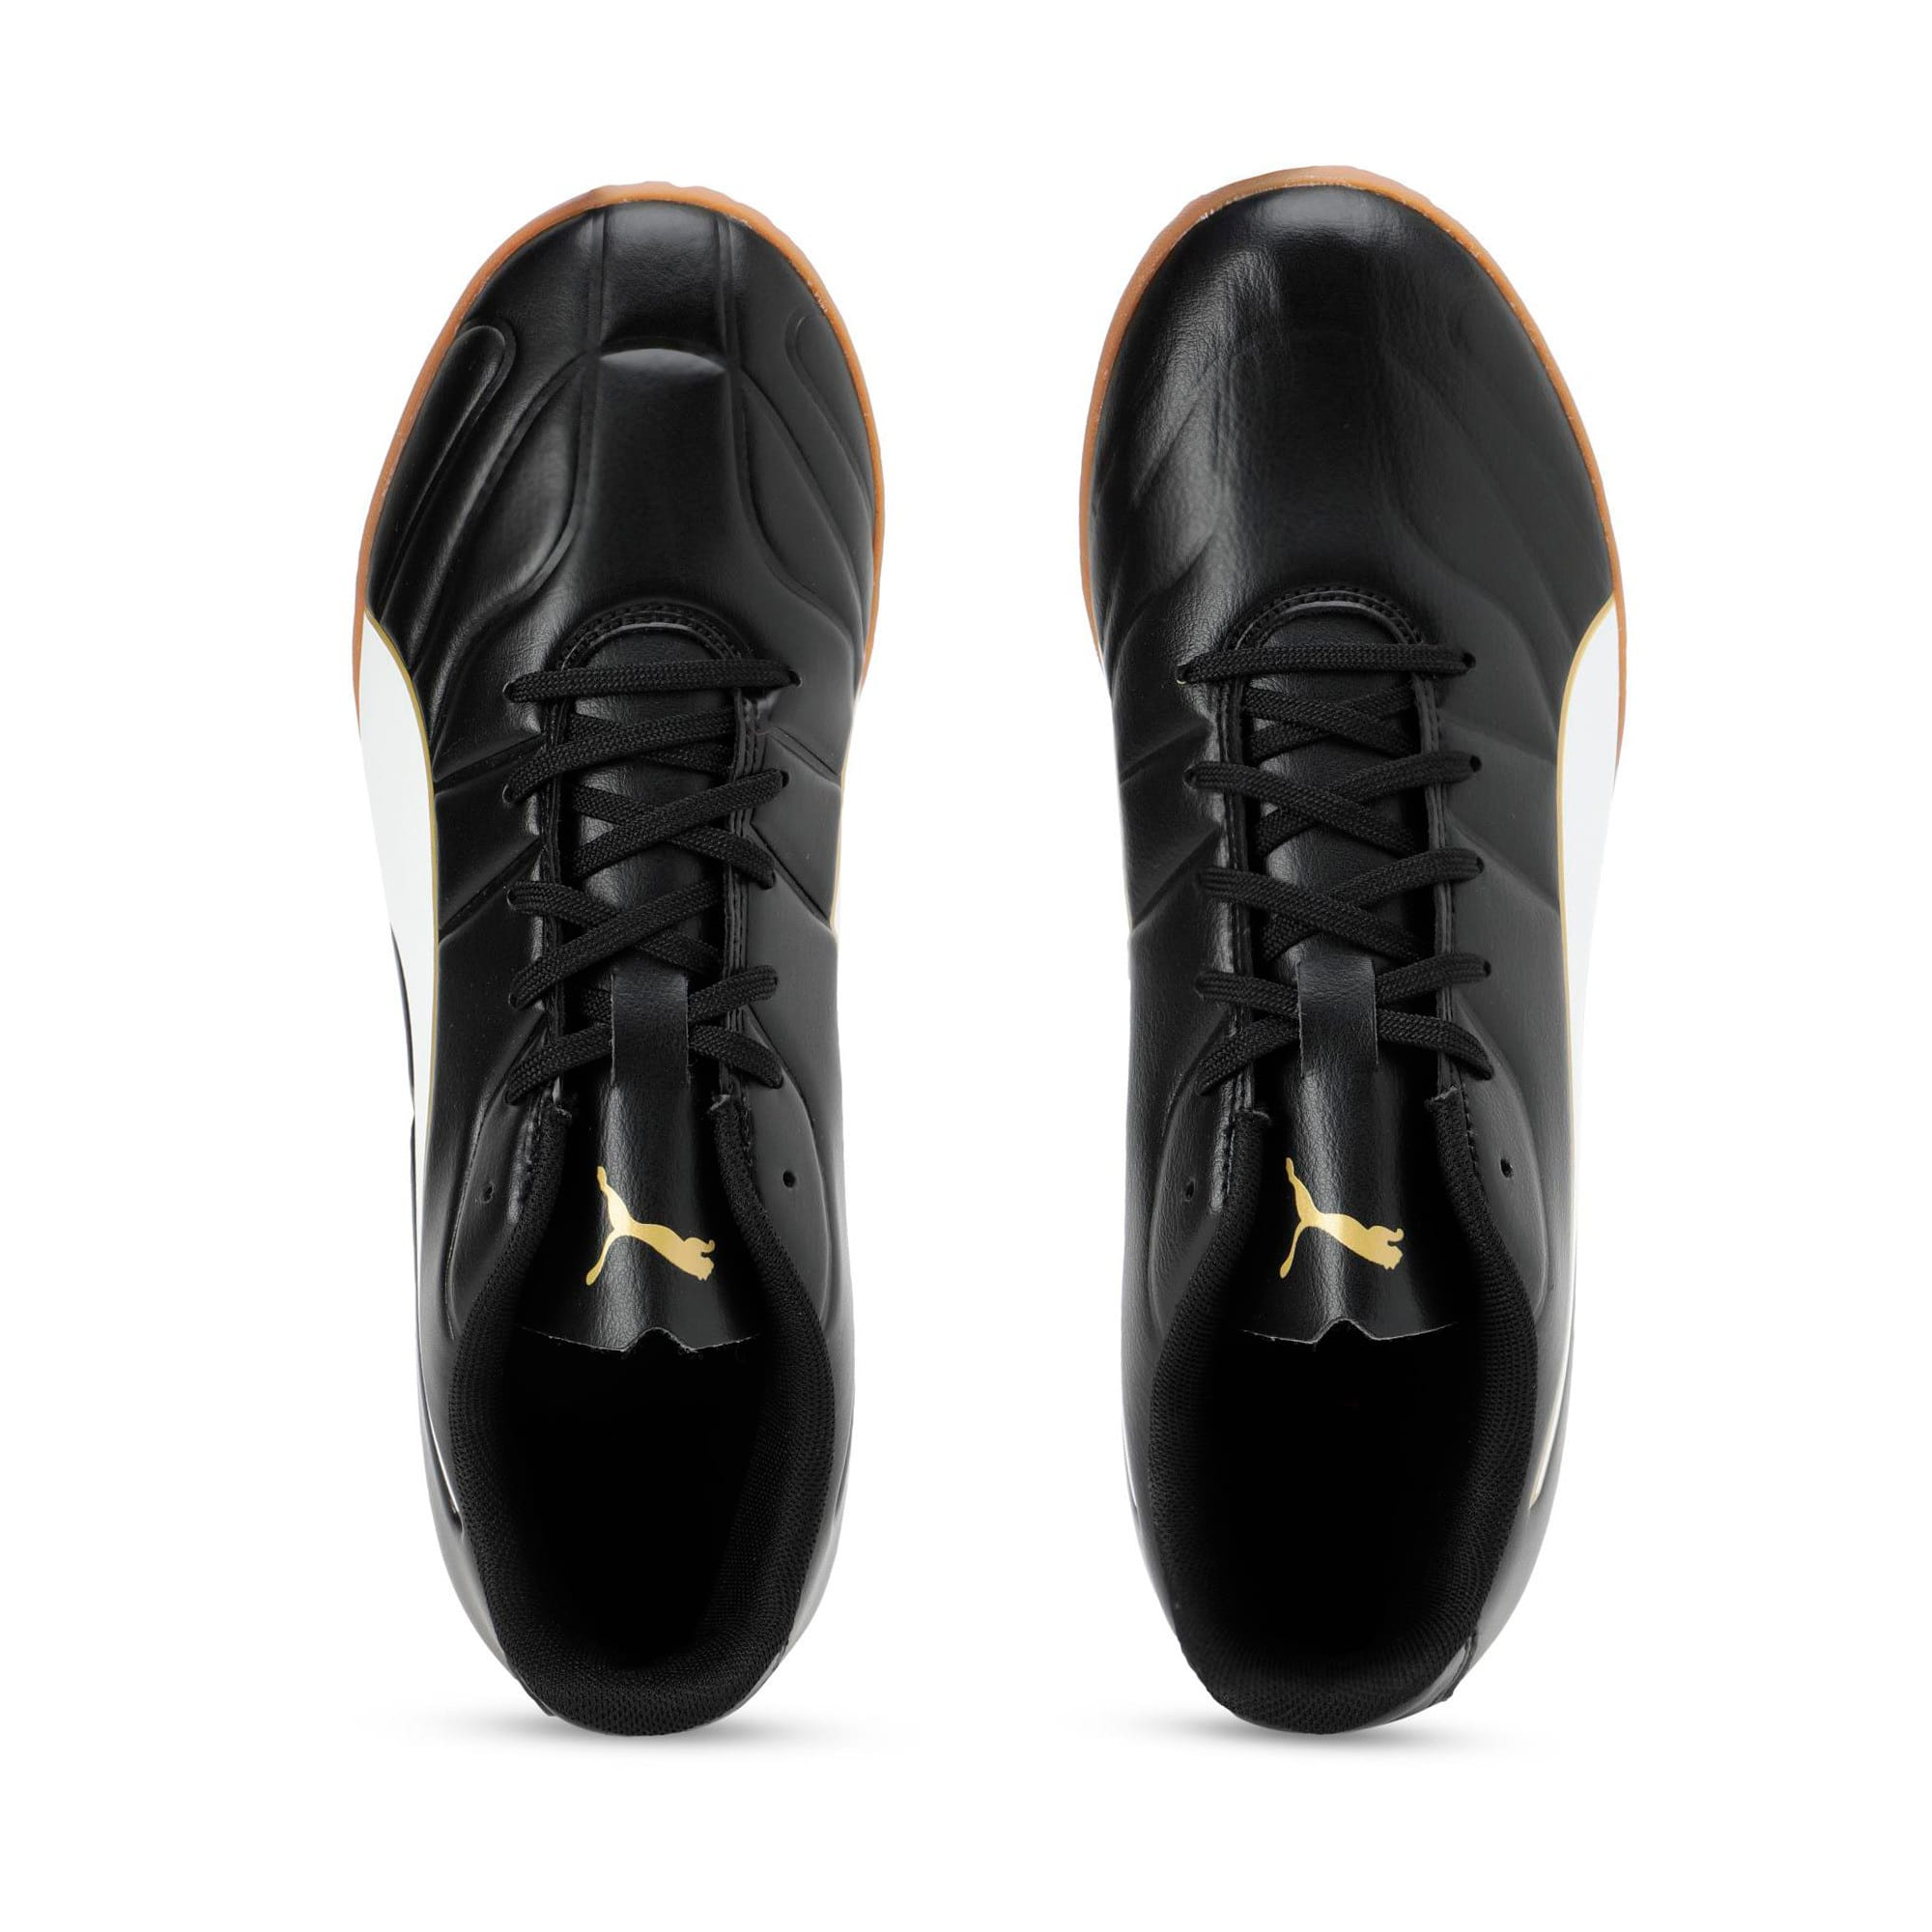 Thumbnail 4 of Classico C II Men's Football Boots, Puma Black-Puma White-Gold, medium-IND